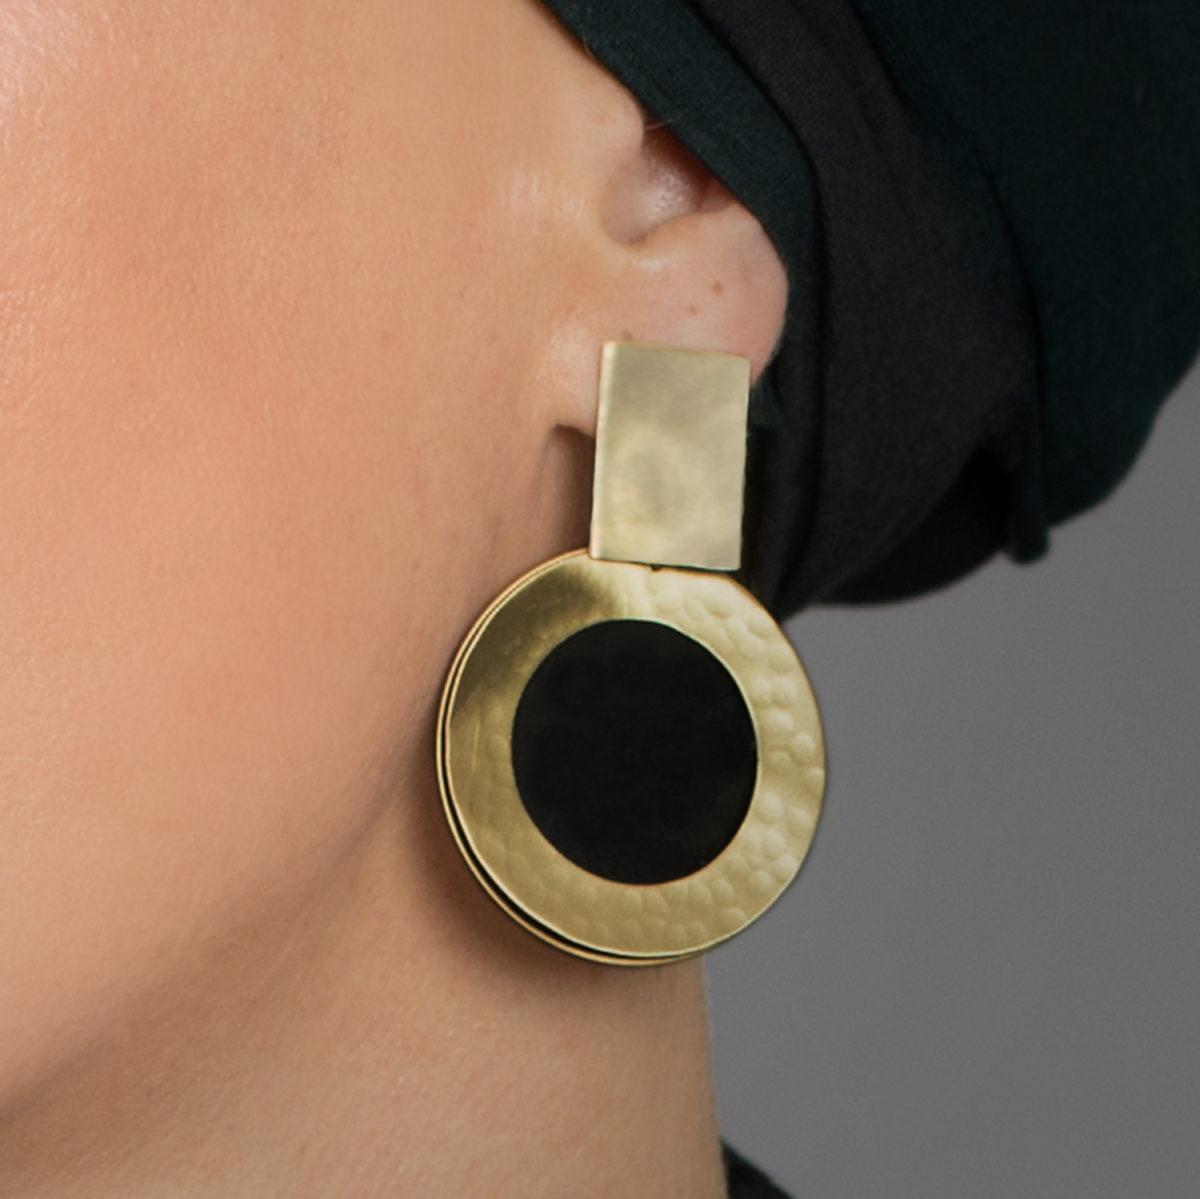 Black-and-Touquise-Ohrringe-gold-schwarz